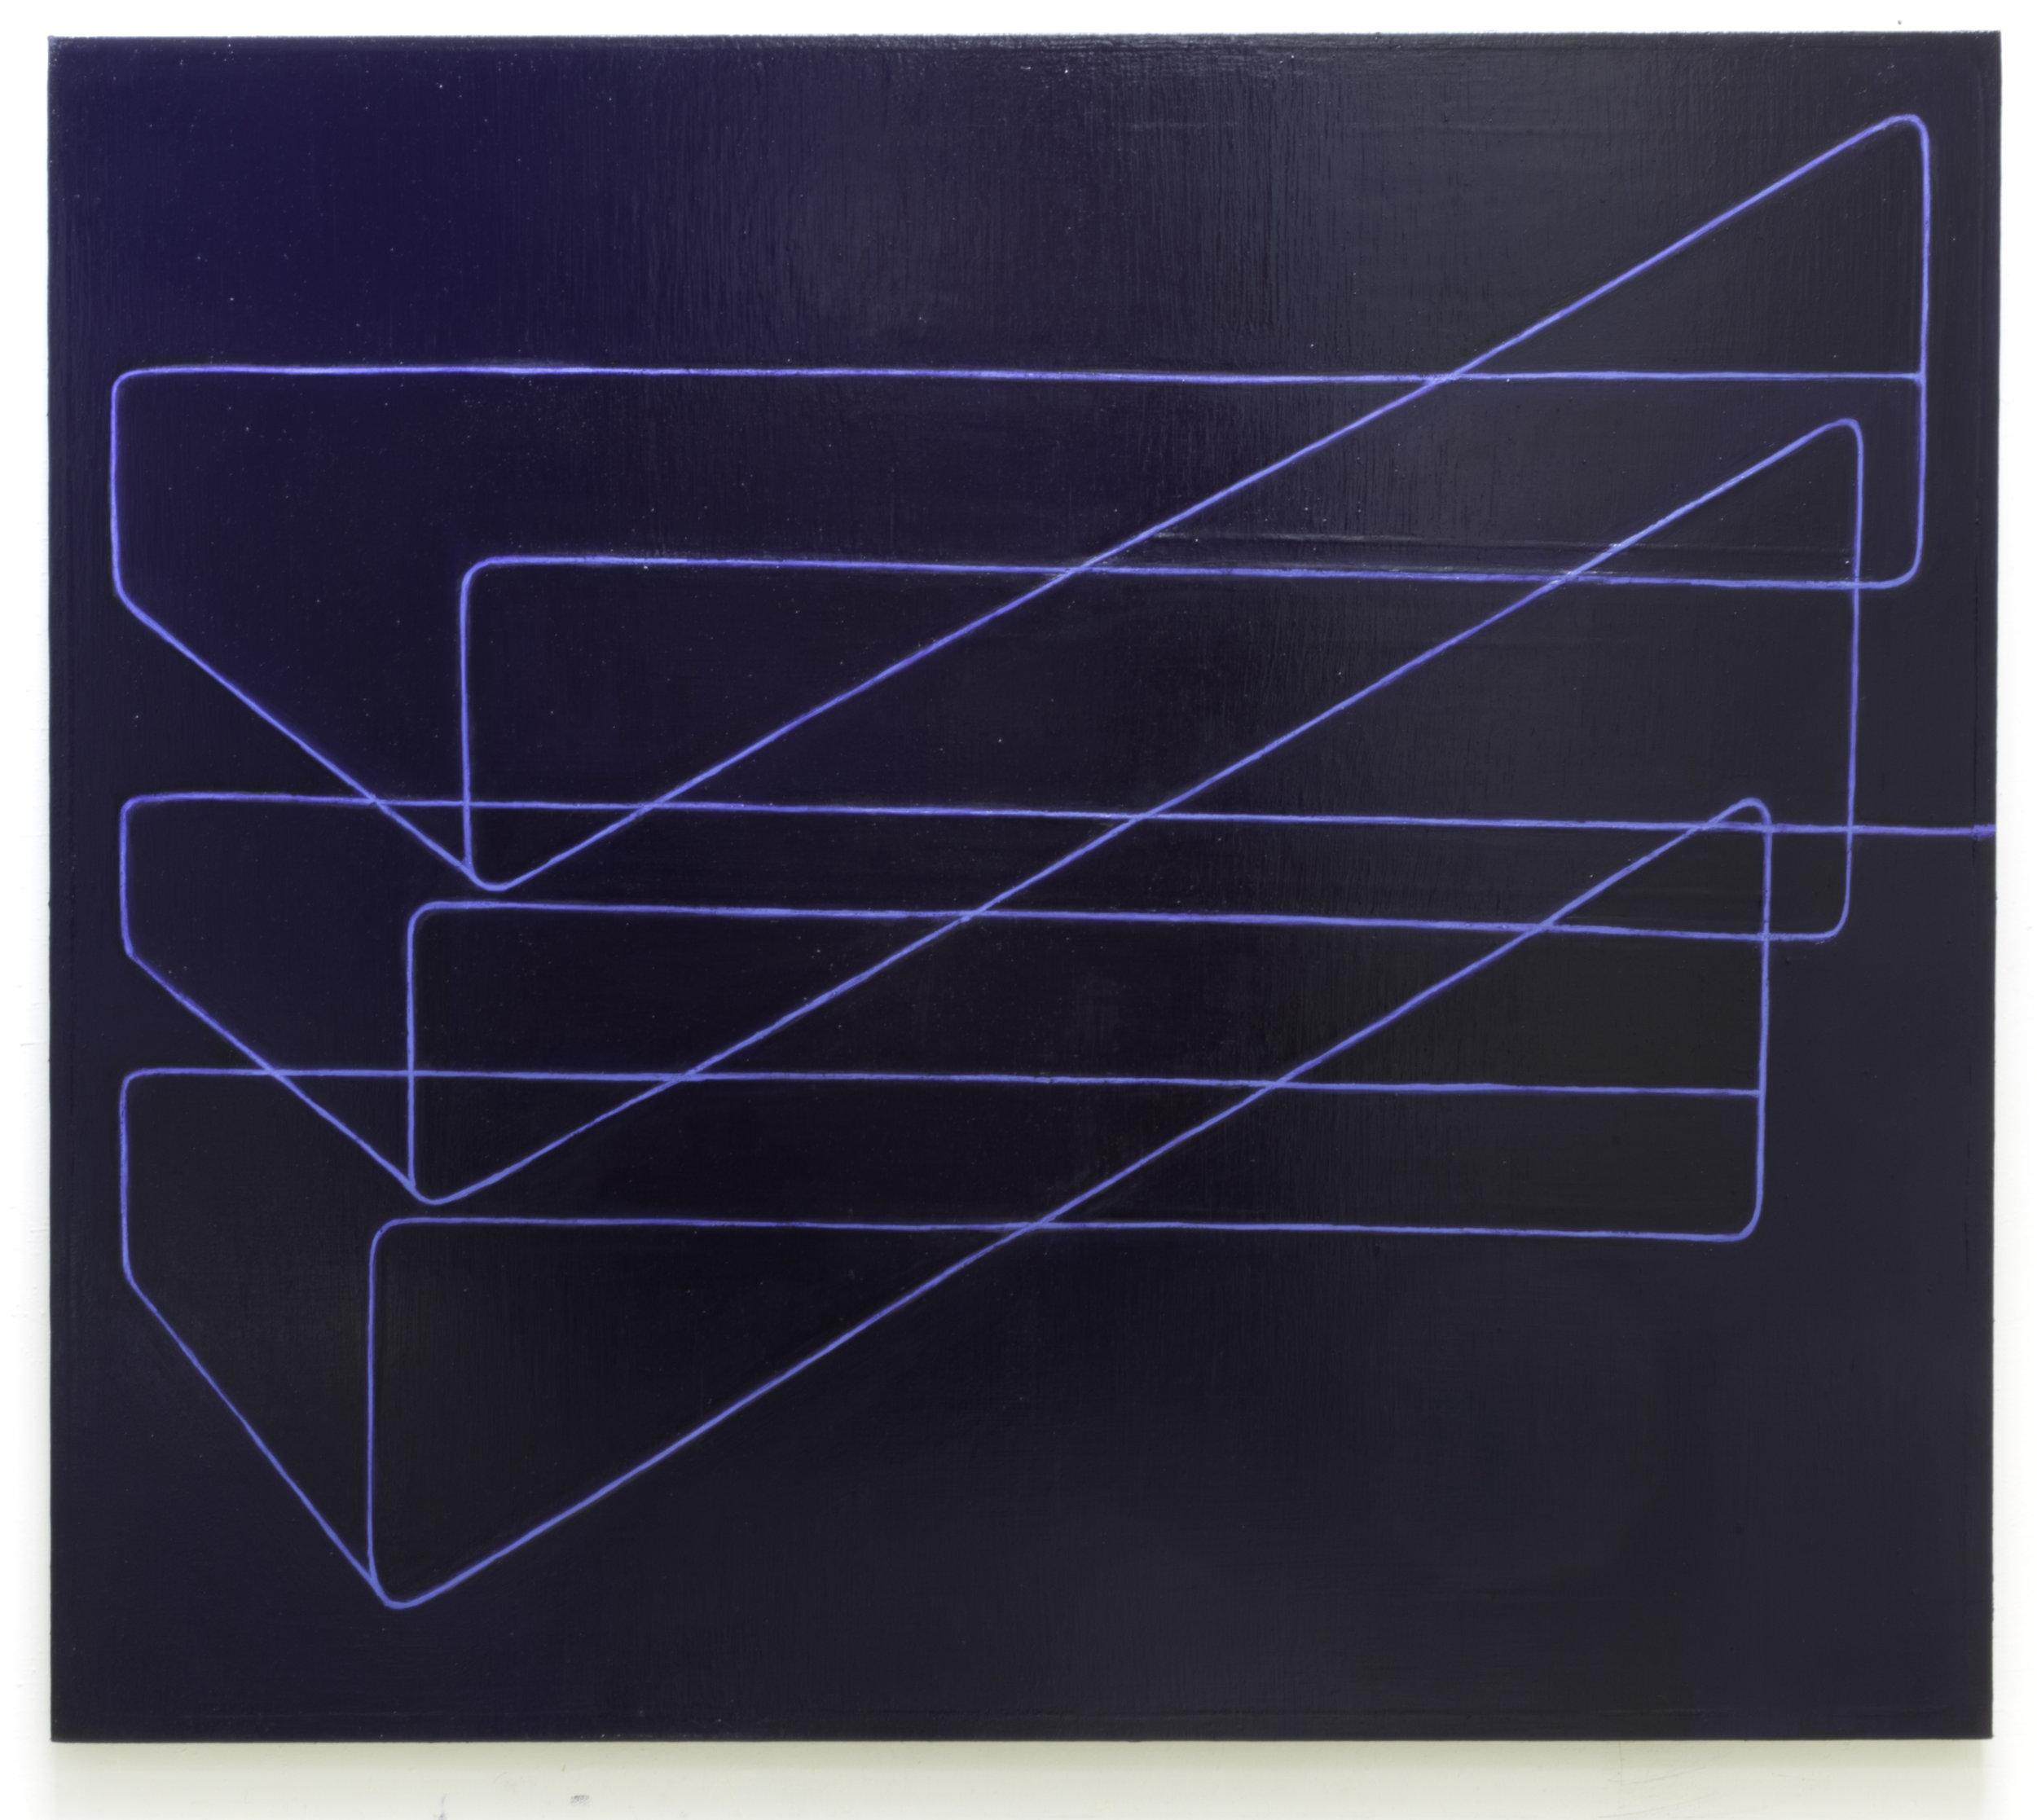 Strait no chaser   ,  2015-17 (Oil on linen, 65 x 74 in / 165 x 188 cm)